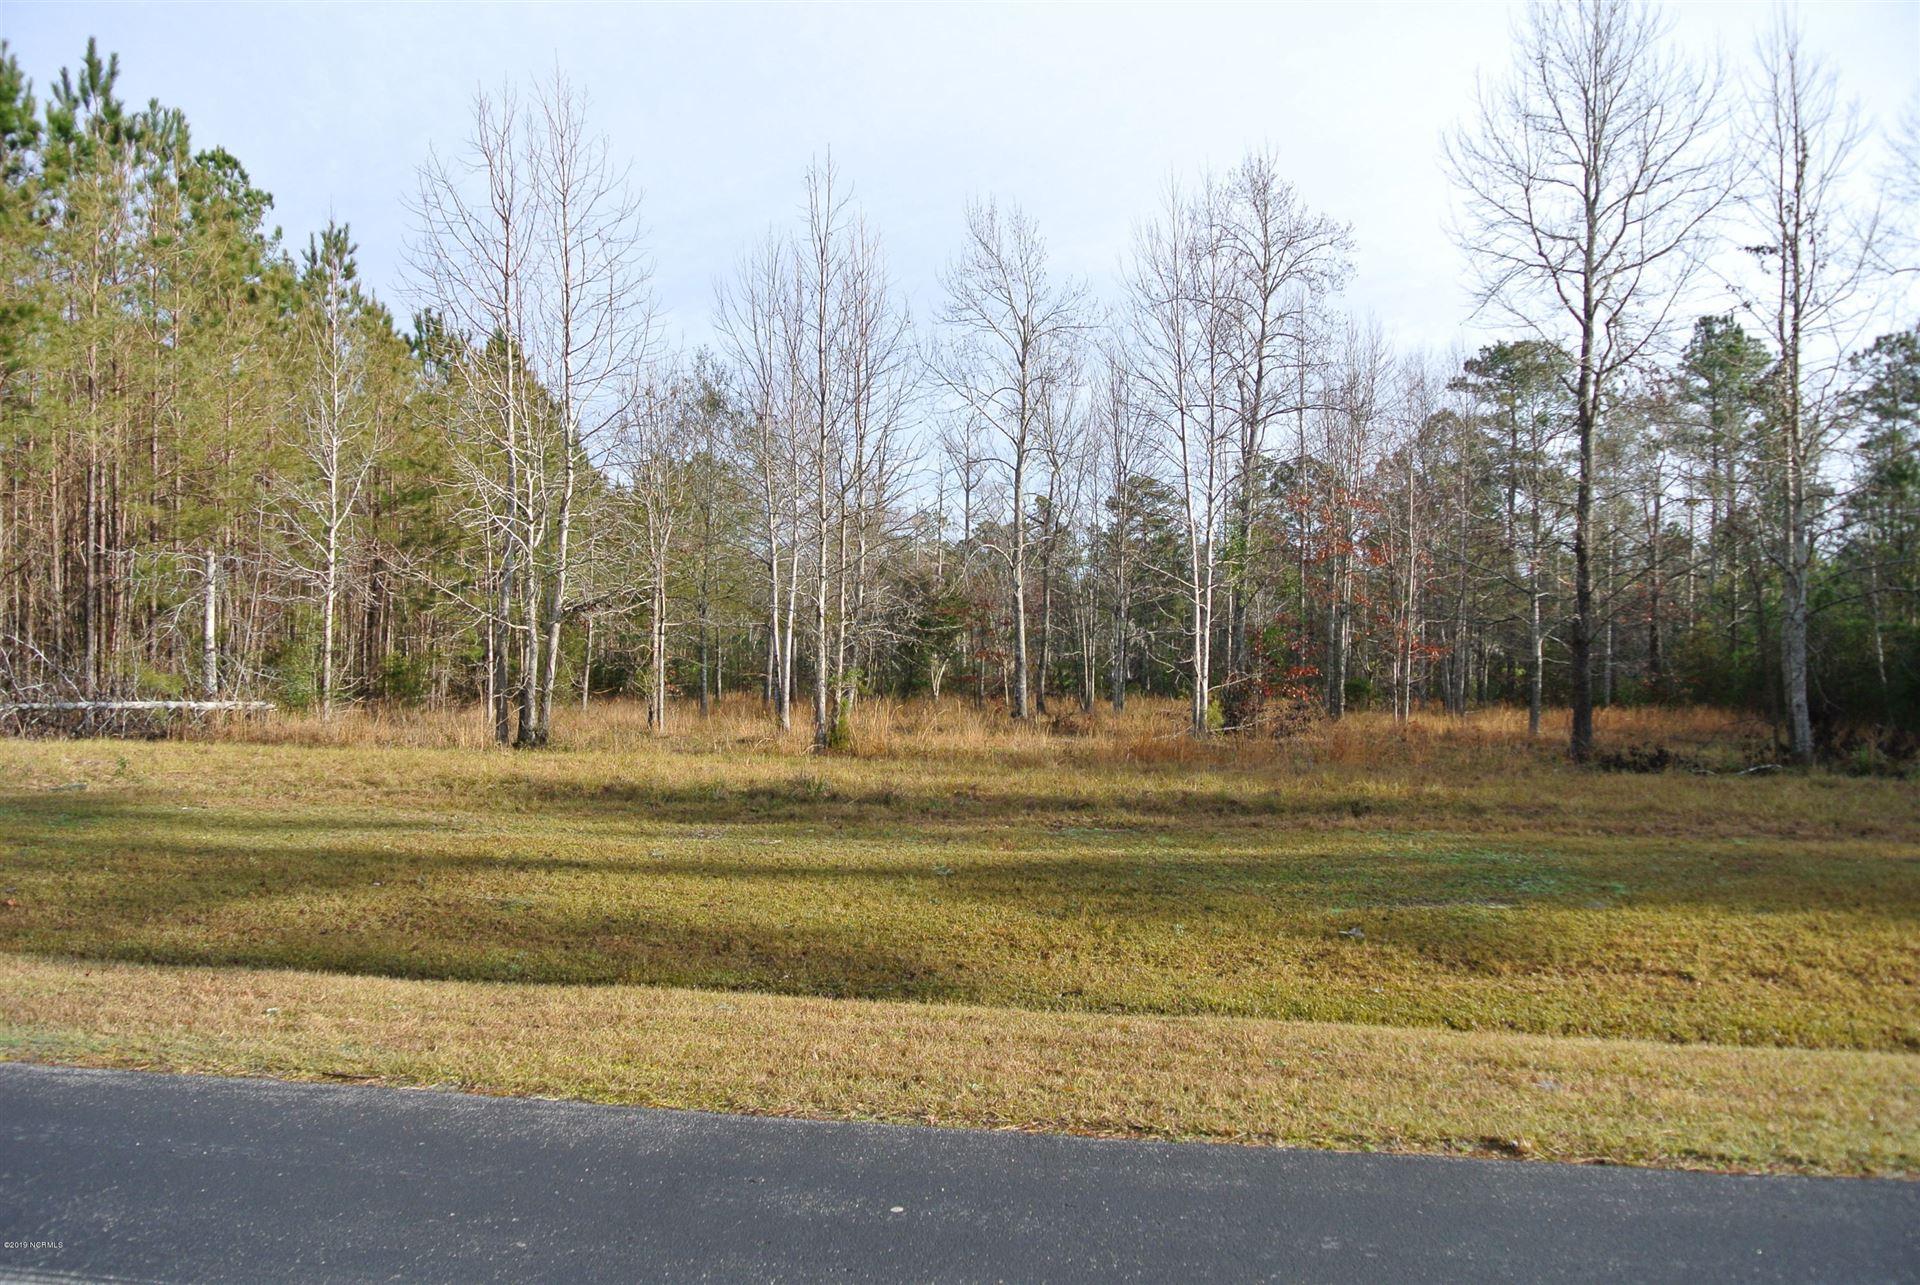 Photo of 187 Garbacon Drive, Beaufort, NC 28516 (MLS # 100275264)